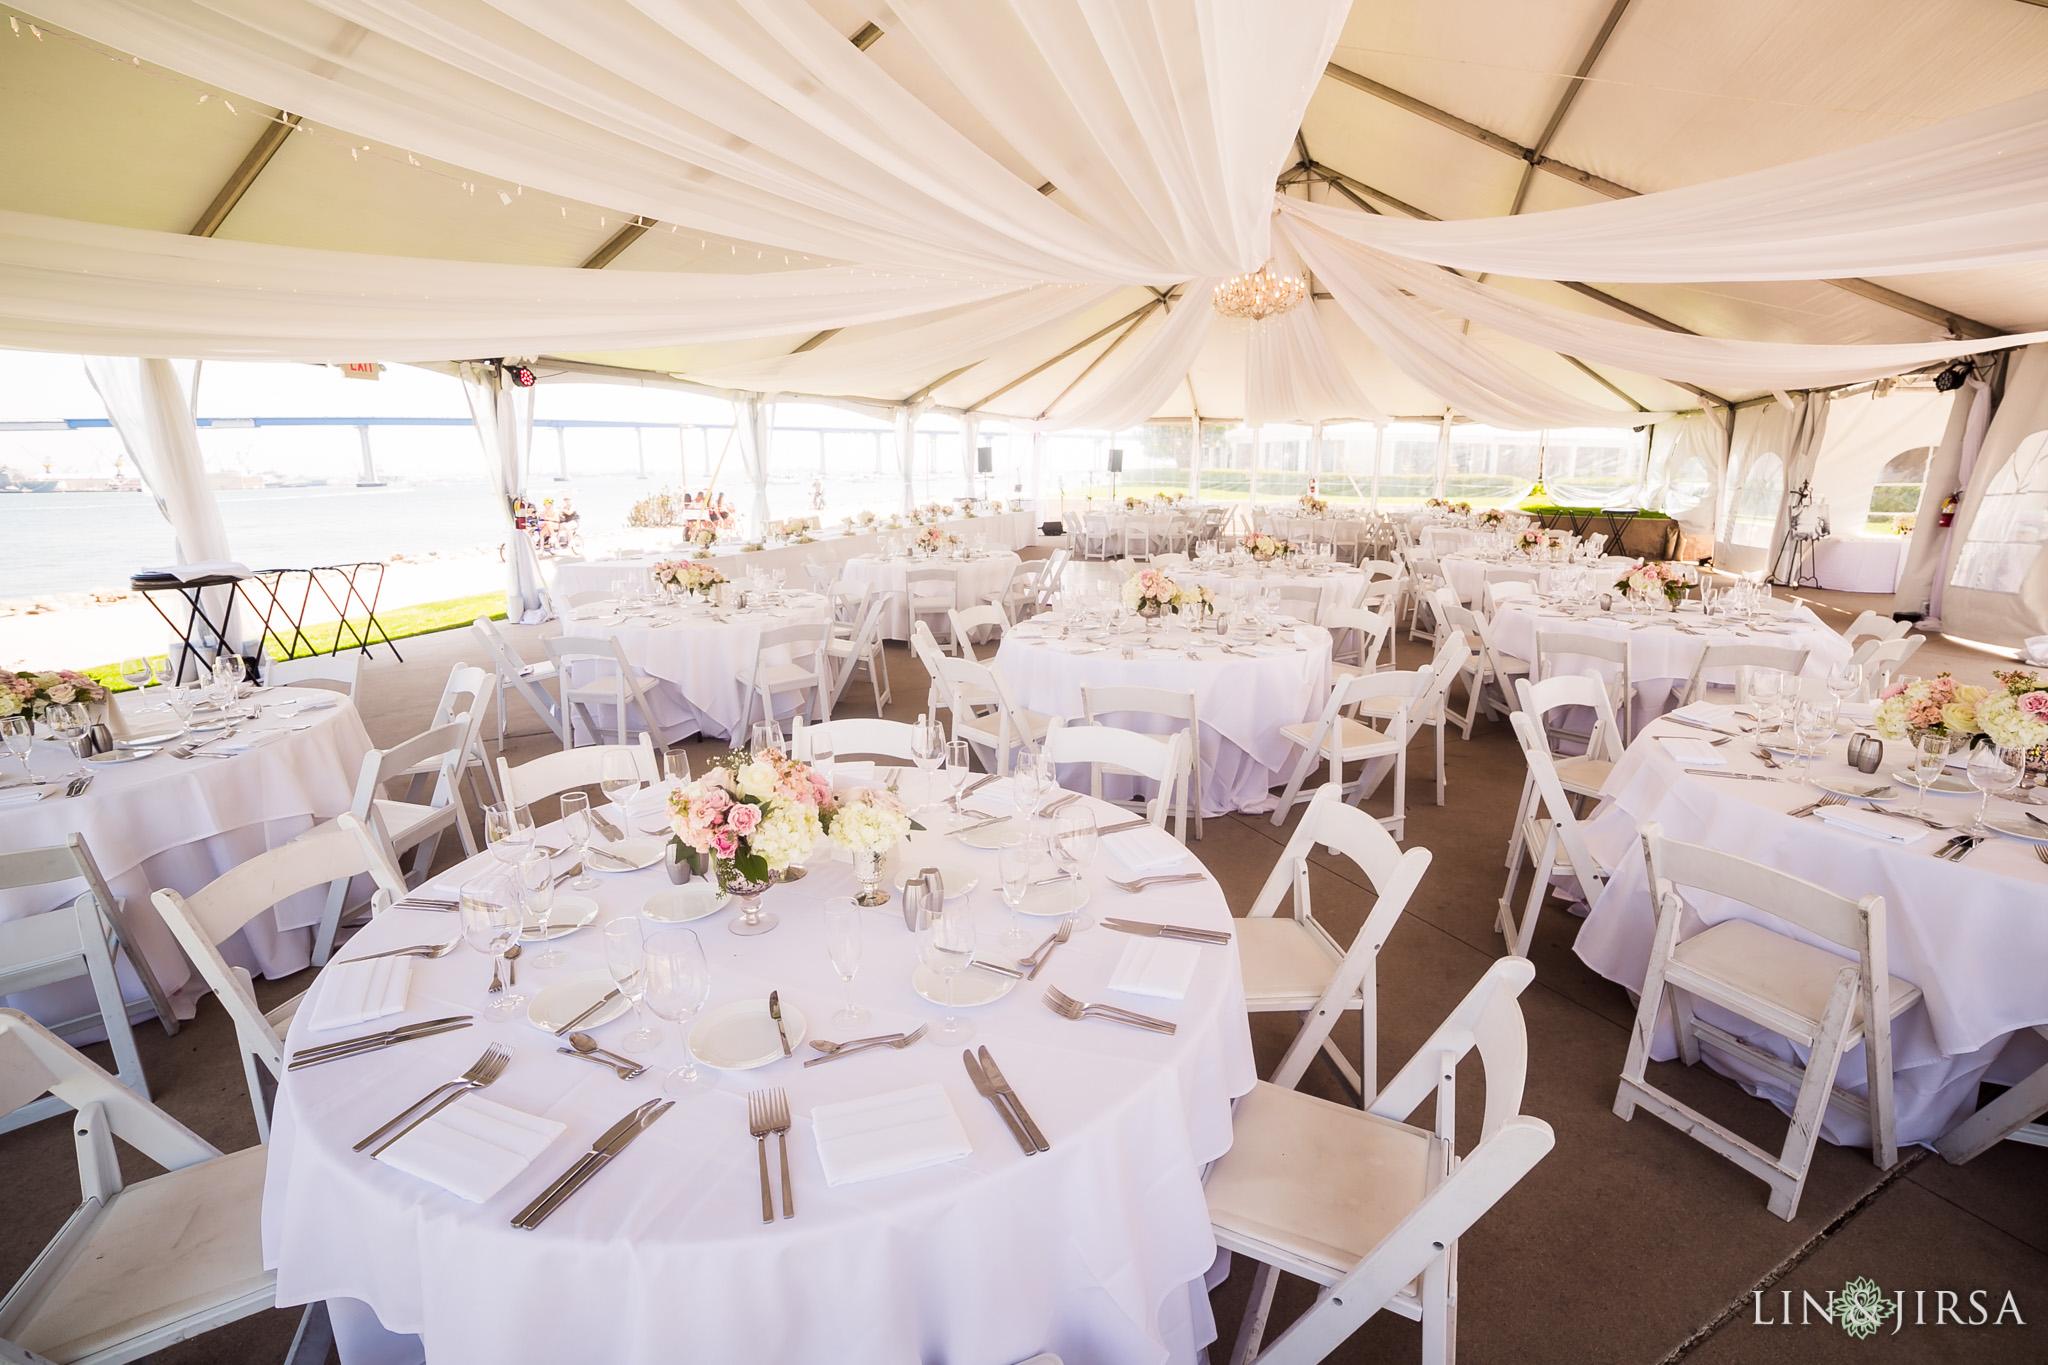 Wedding Venue Coronado Island Marriott Resort Planner Creative Affairs Inc Bridal Hair Makeup Rare Bird Brides Florist J Designs